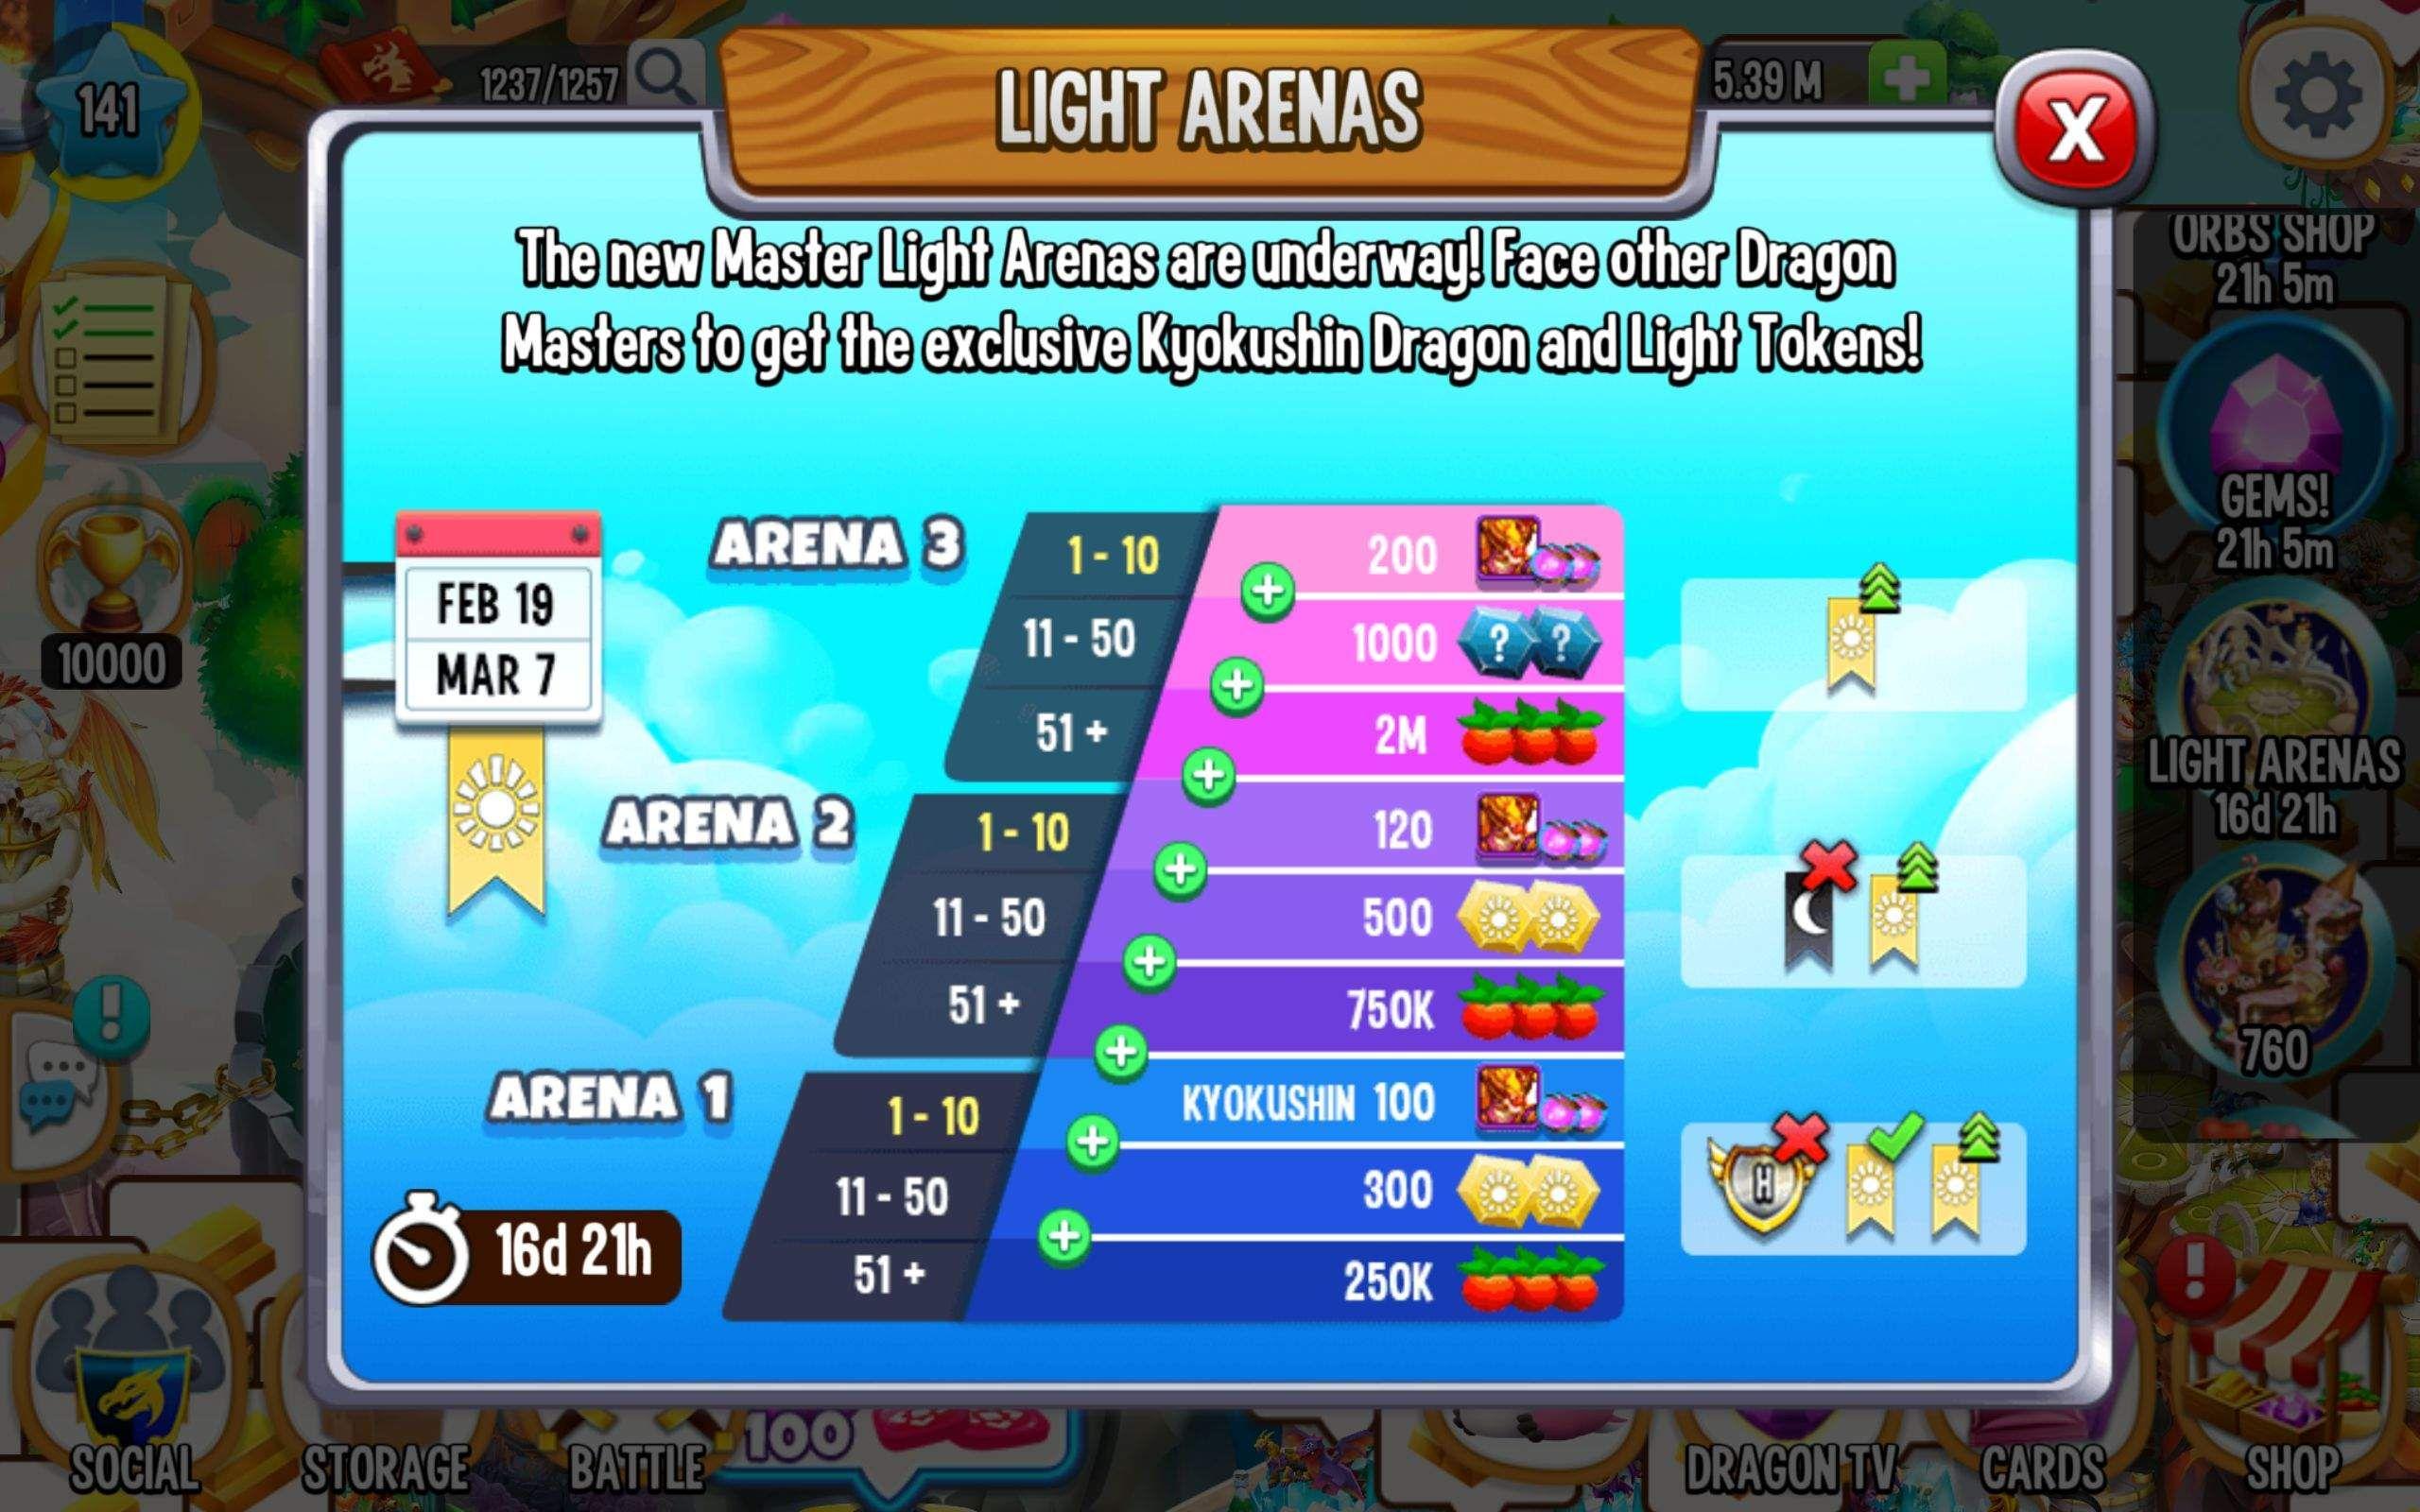 0_1607407761526_021920 - 030720 master light.jpeg